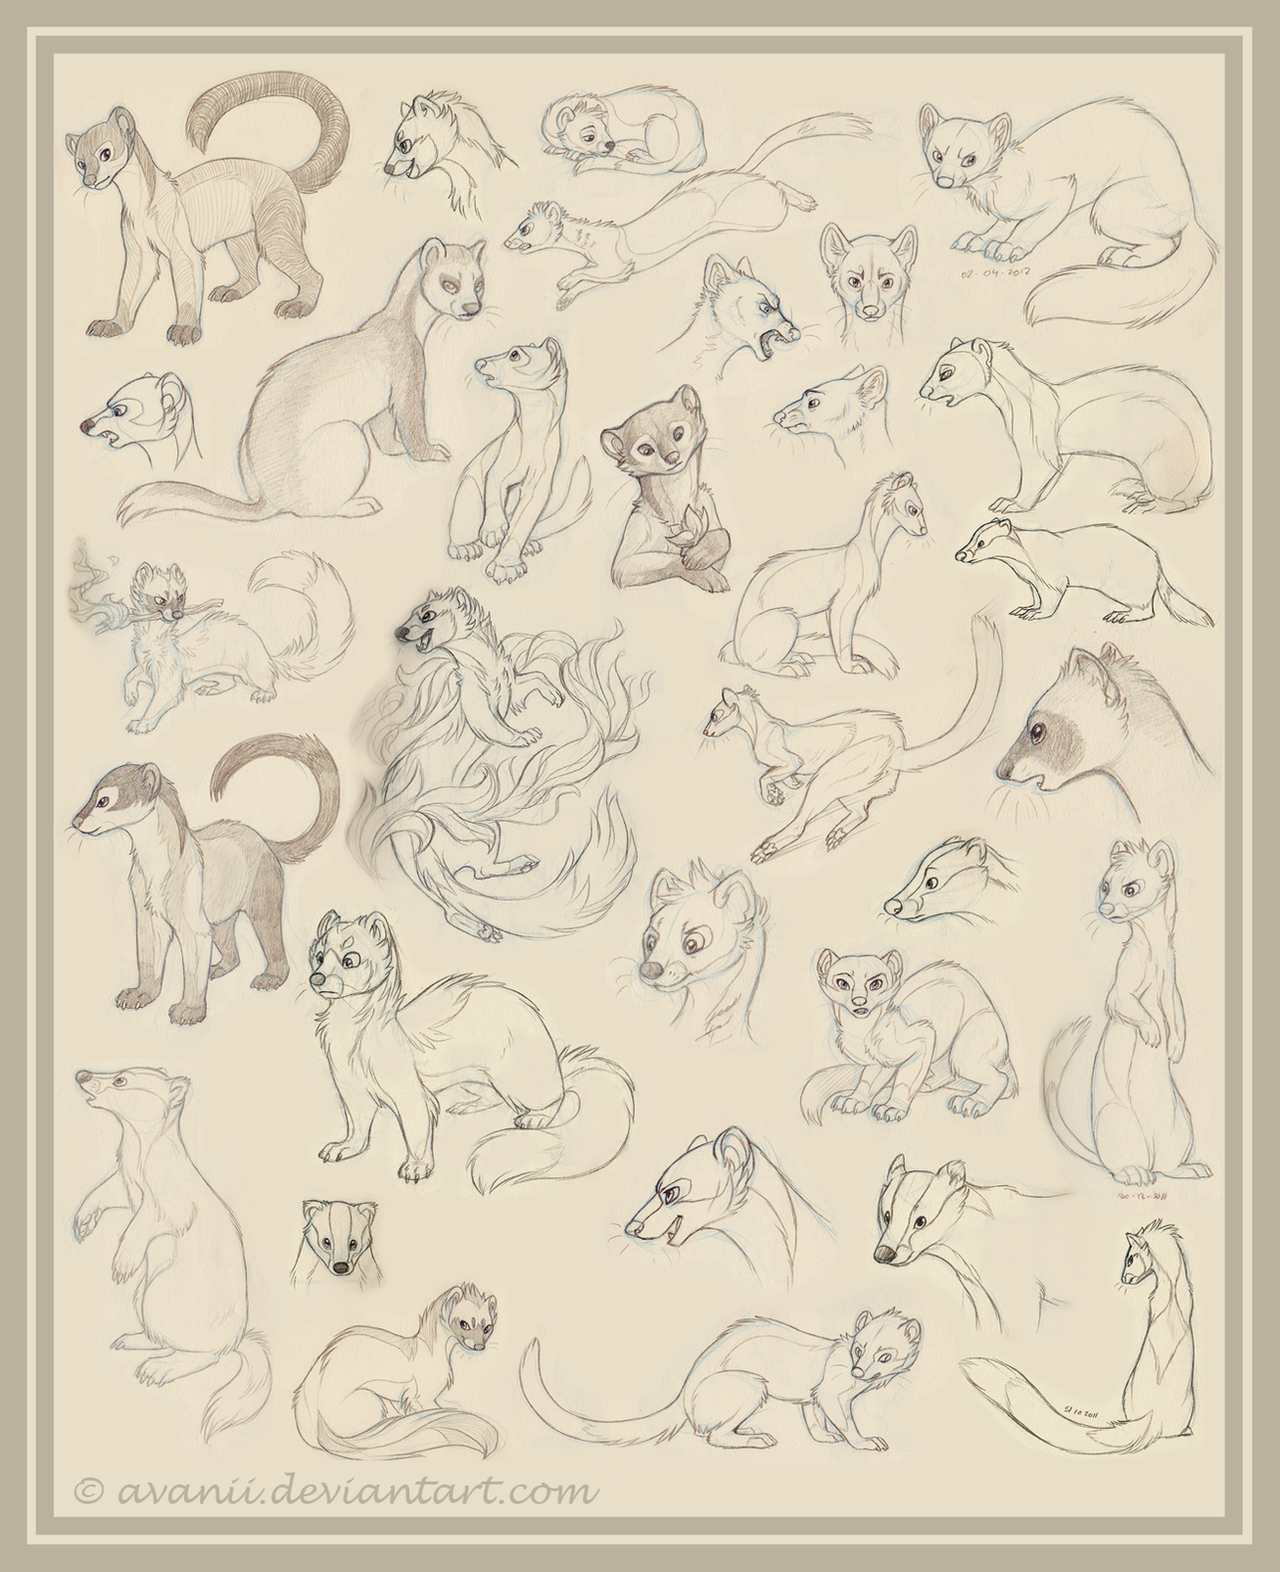 Sketchdump: Mustelids by Avanii